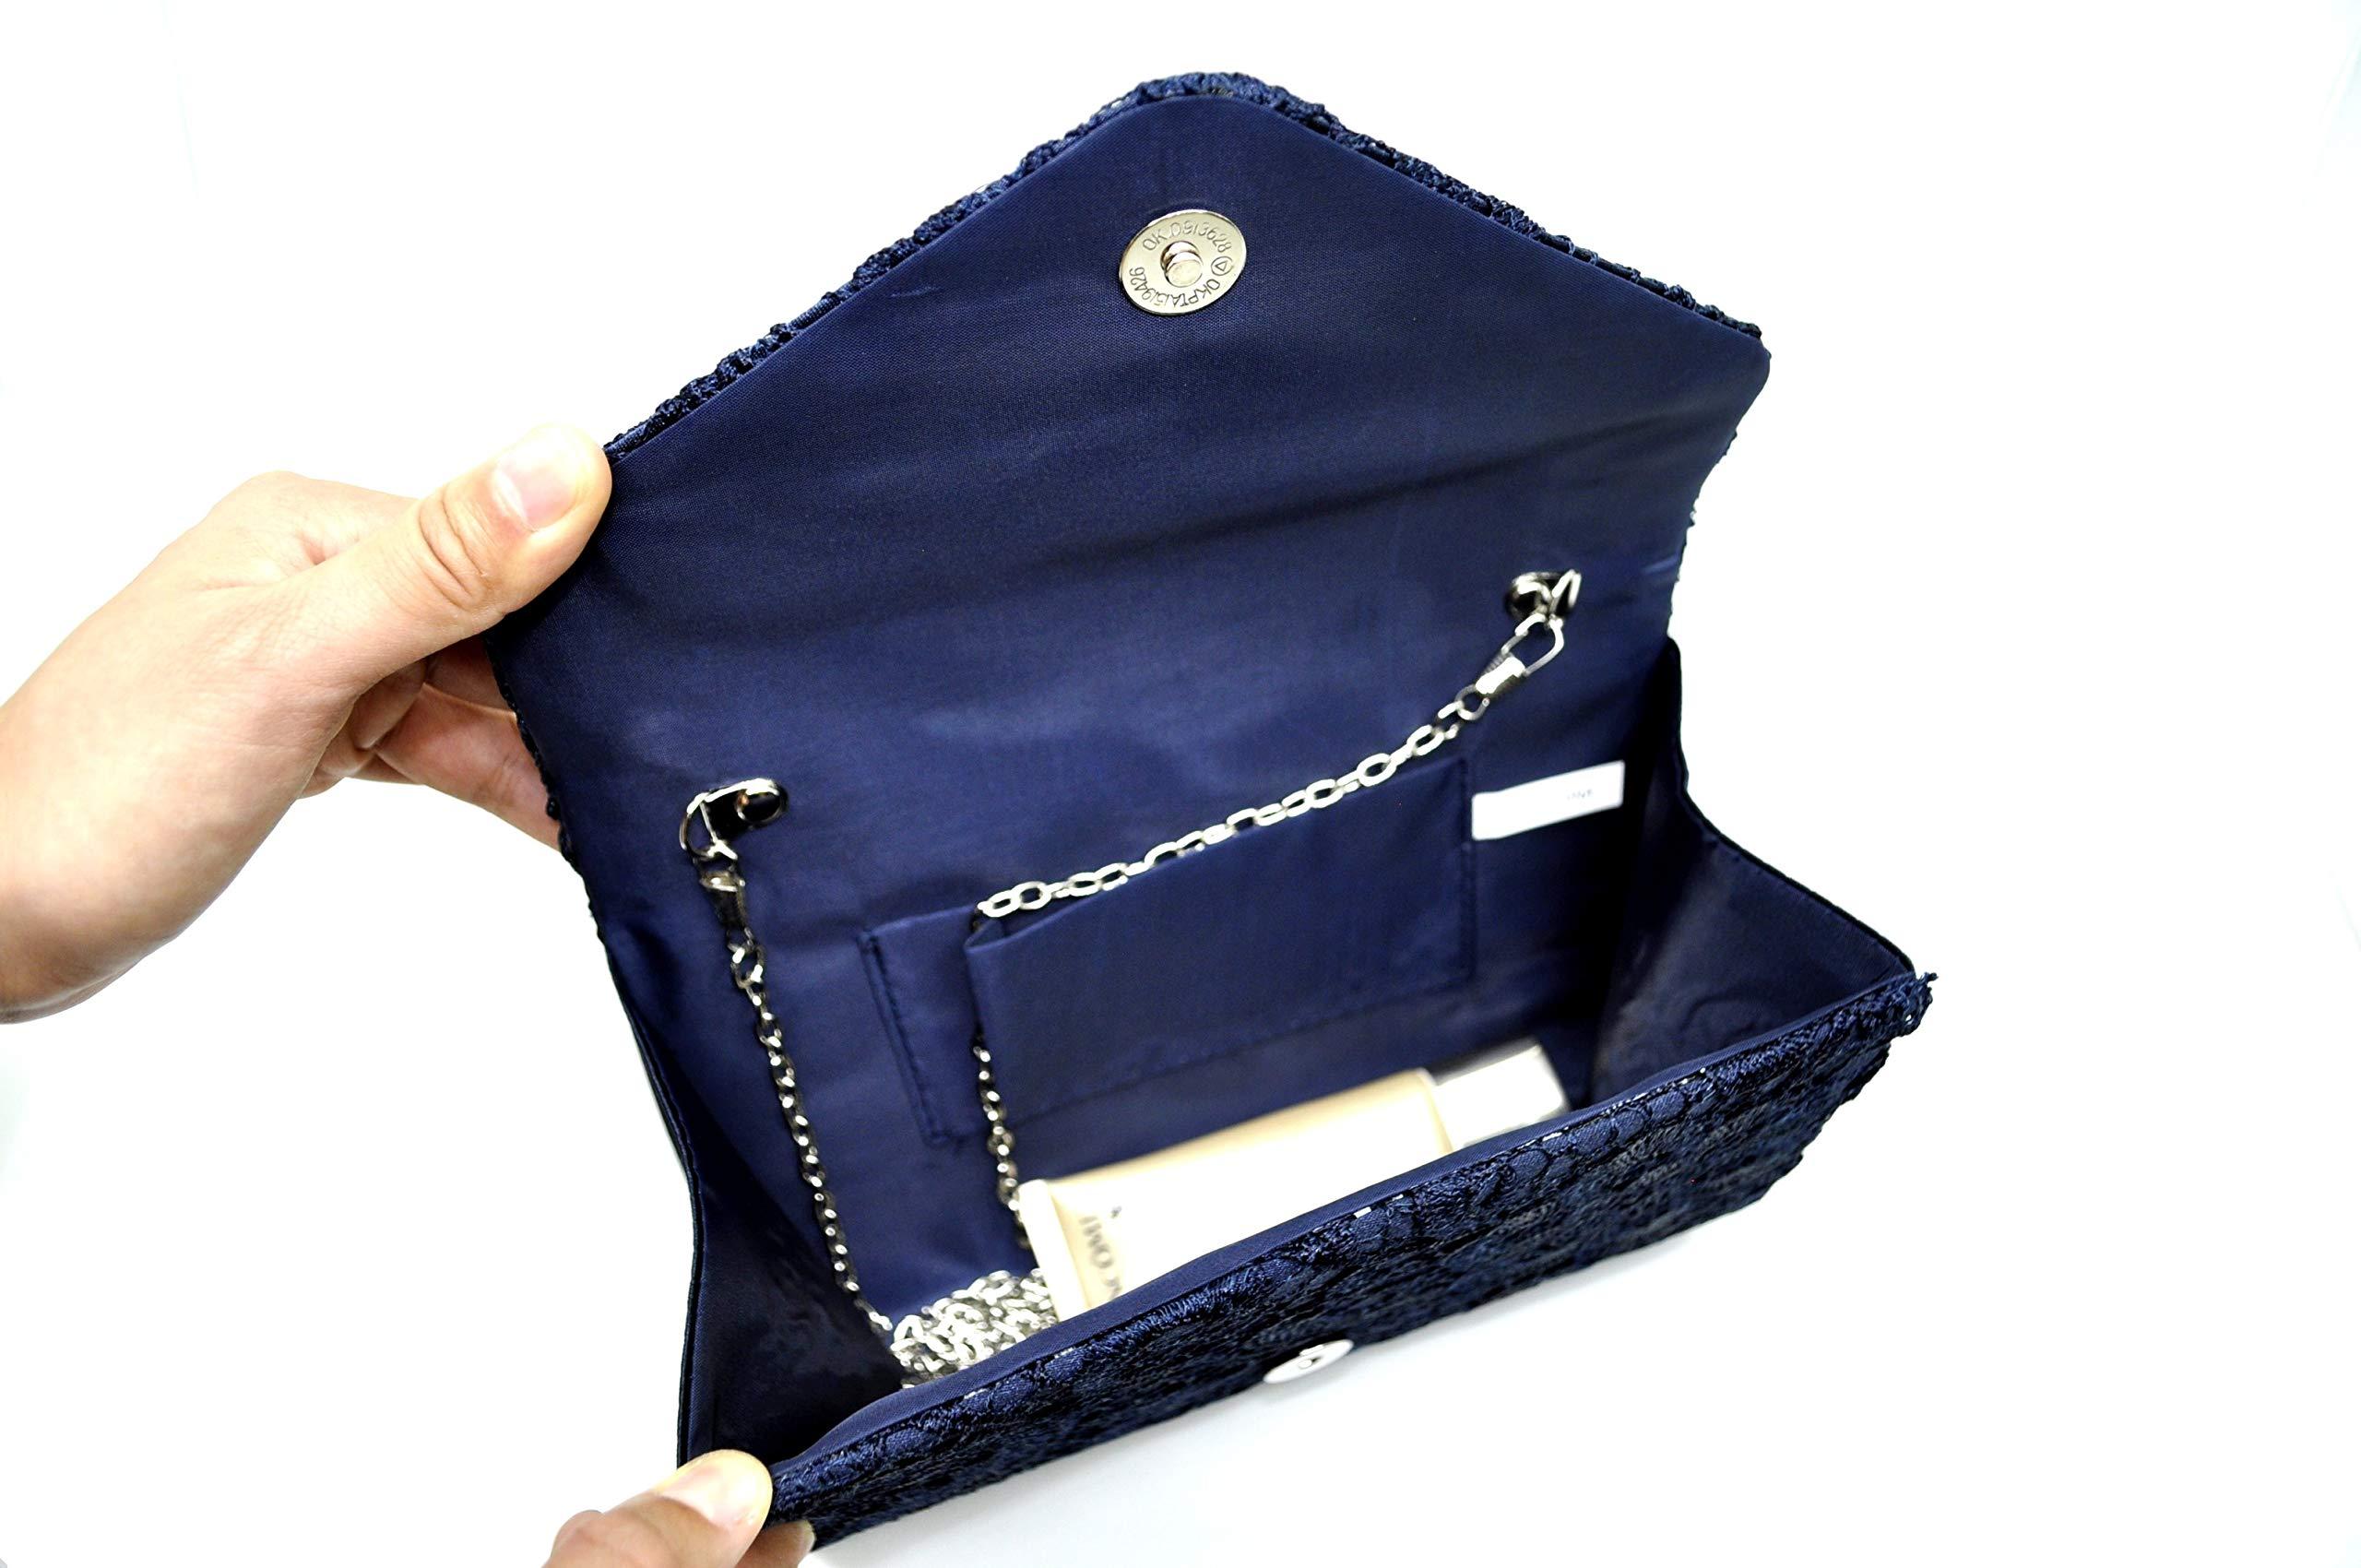 Nodykka Wedding Pleated Floral Lace Clutches Bag Evening Cross Body Handbags Purse by Nodykka (Image #4)